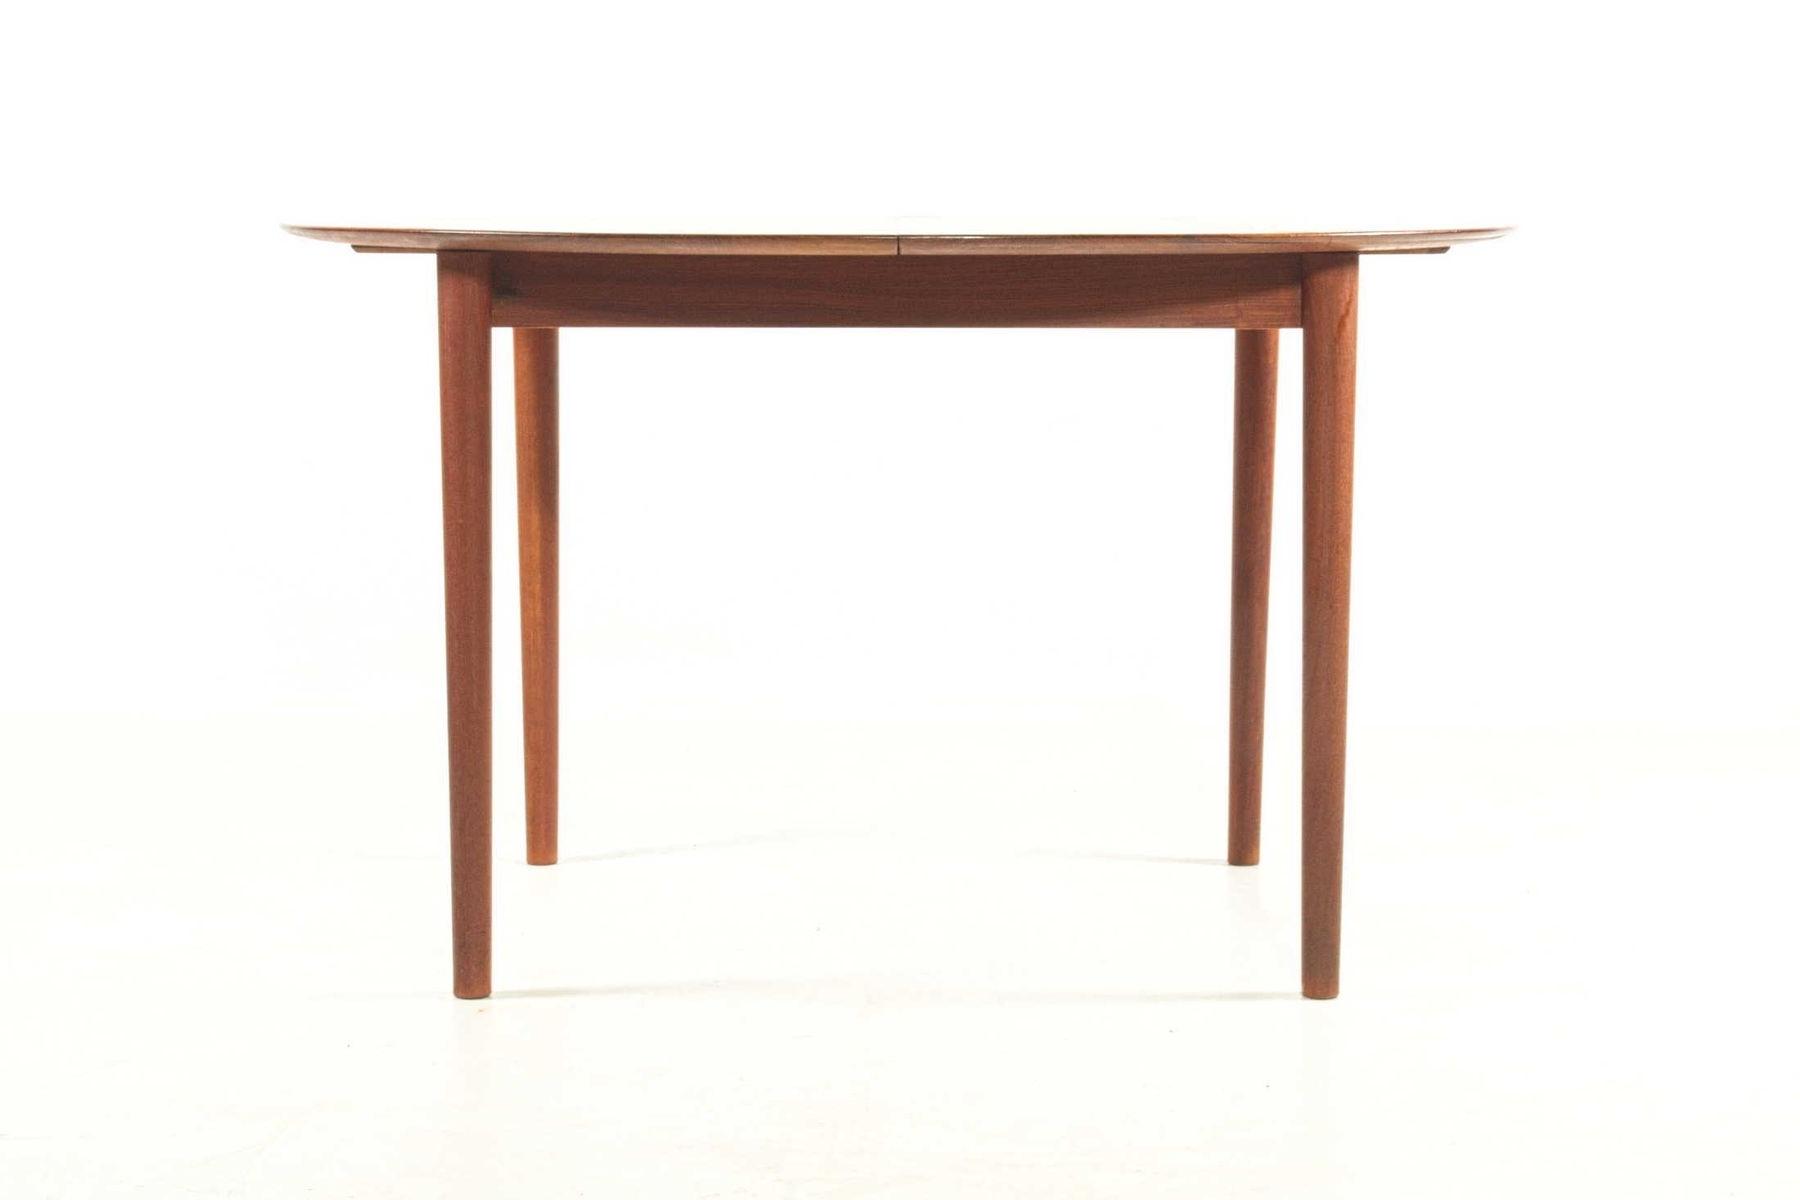 Popular Extendable Dining Tablepeter Hvidt For Søborg Møbelfabrik, 1950S Inside Lassen Extension Rectangle Dining Tables (View 21 of 25)